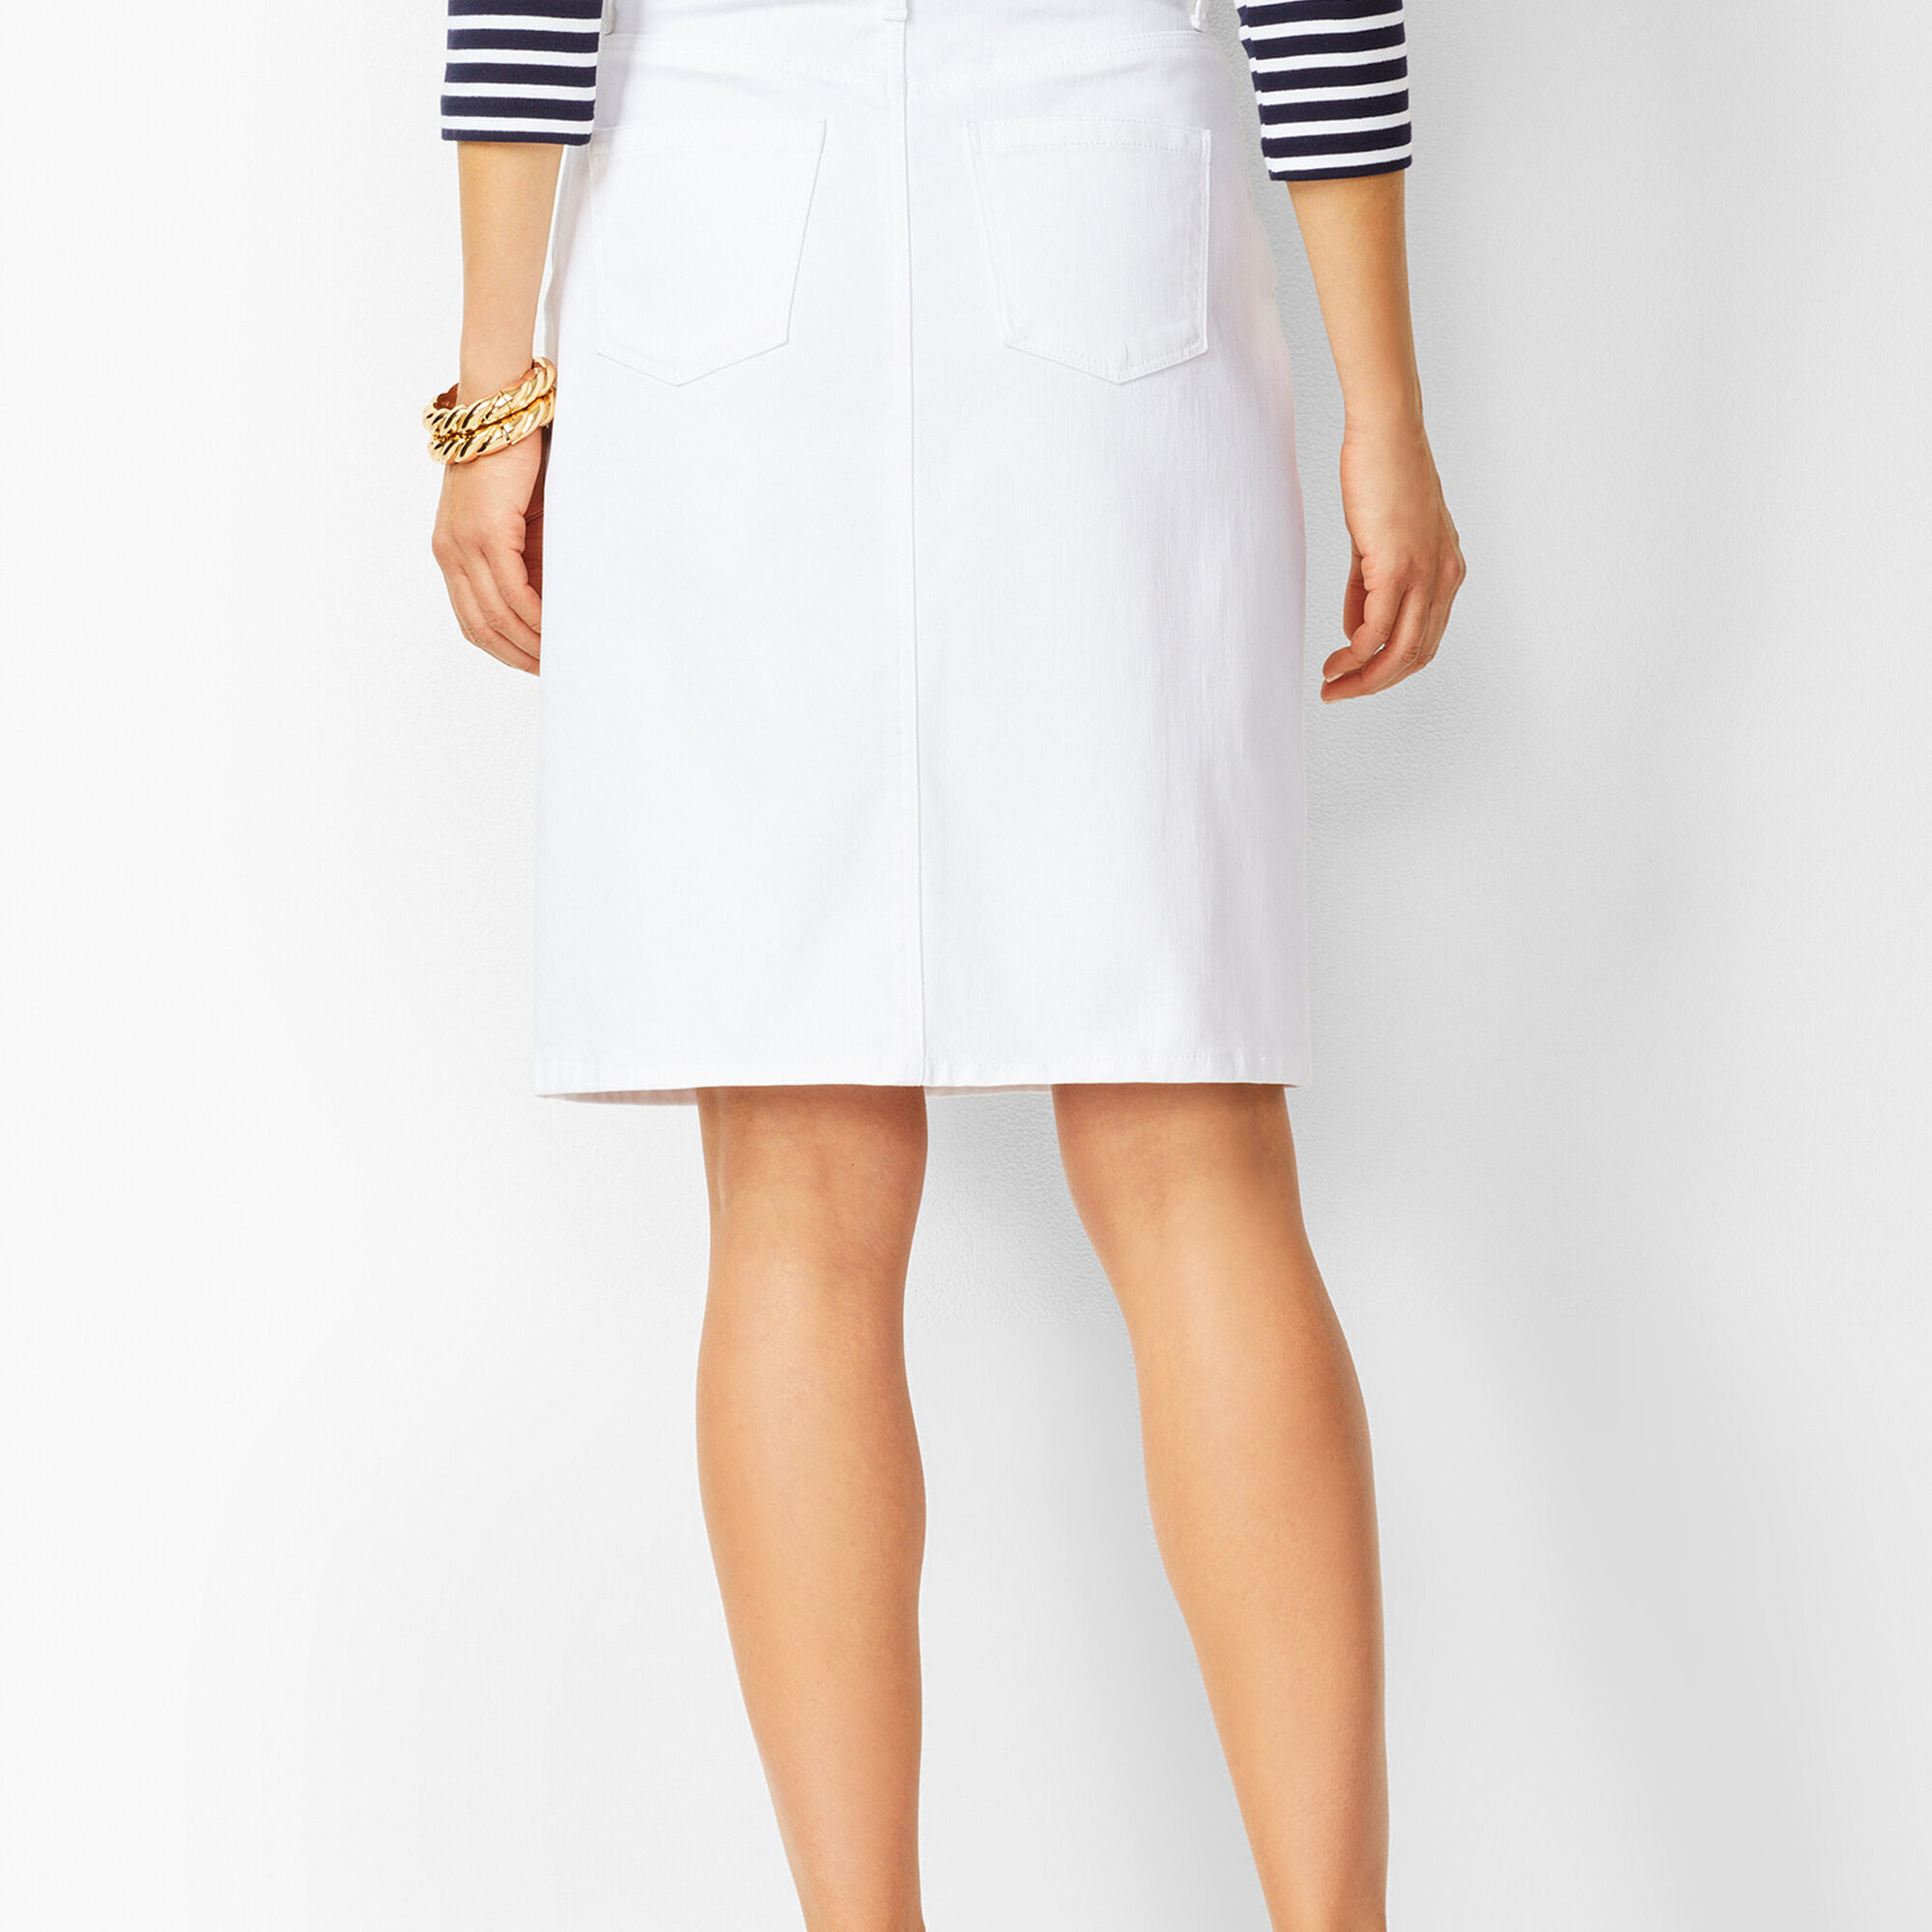 huge sale best selection of 100% satisfaction Classic Denim Skirt - White | Talbots